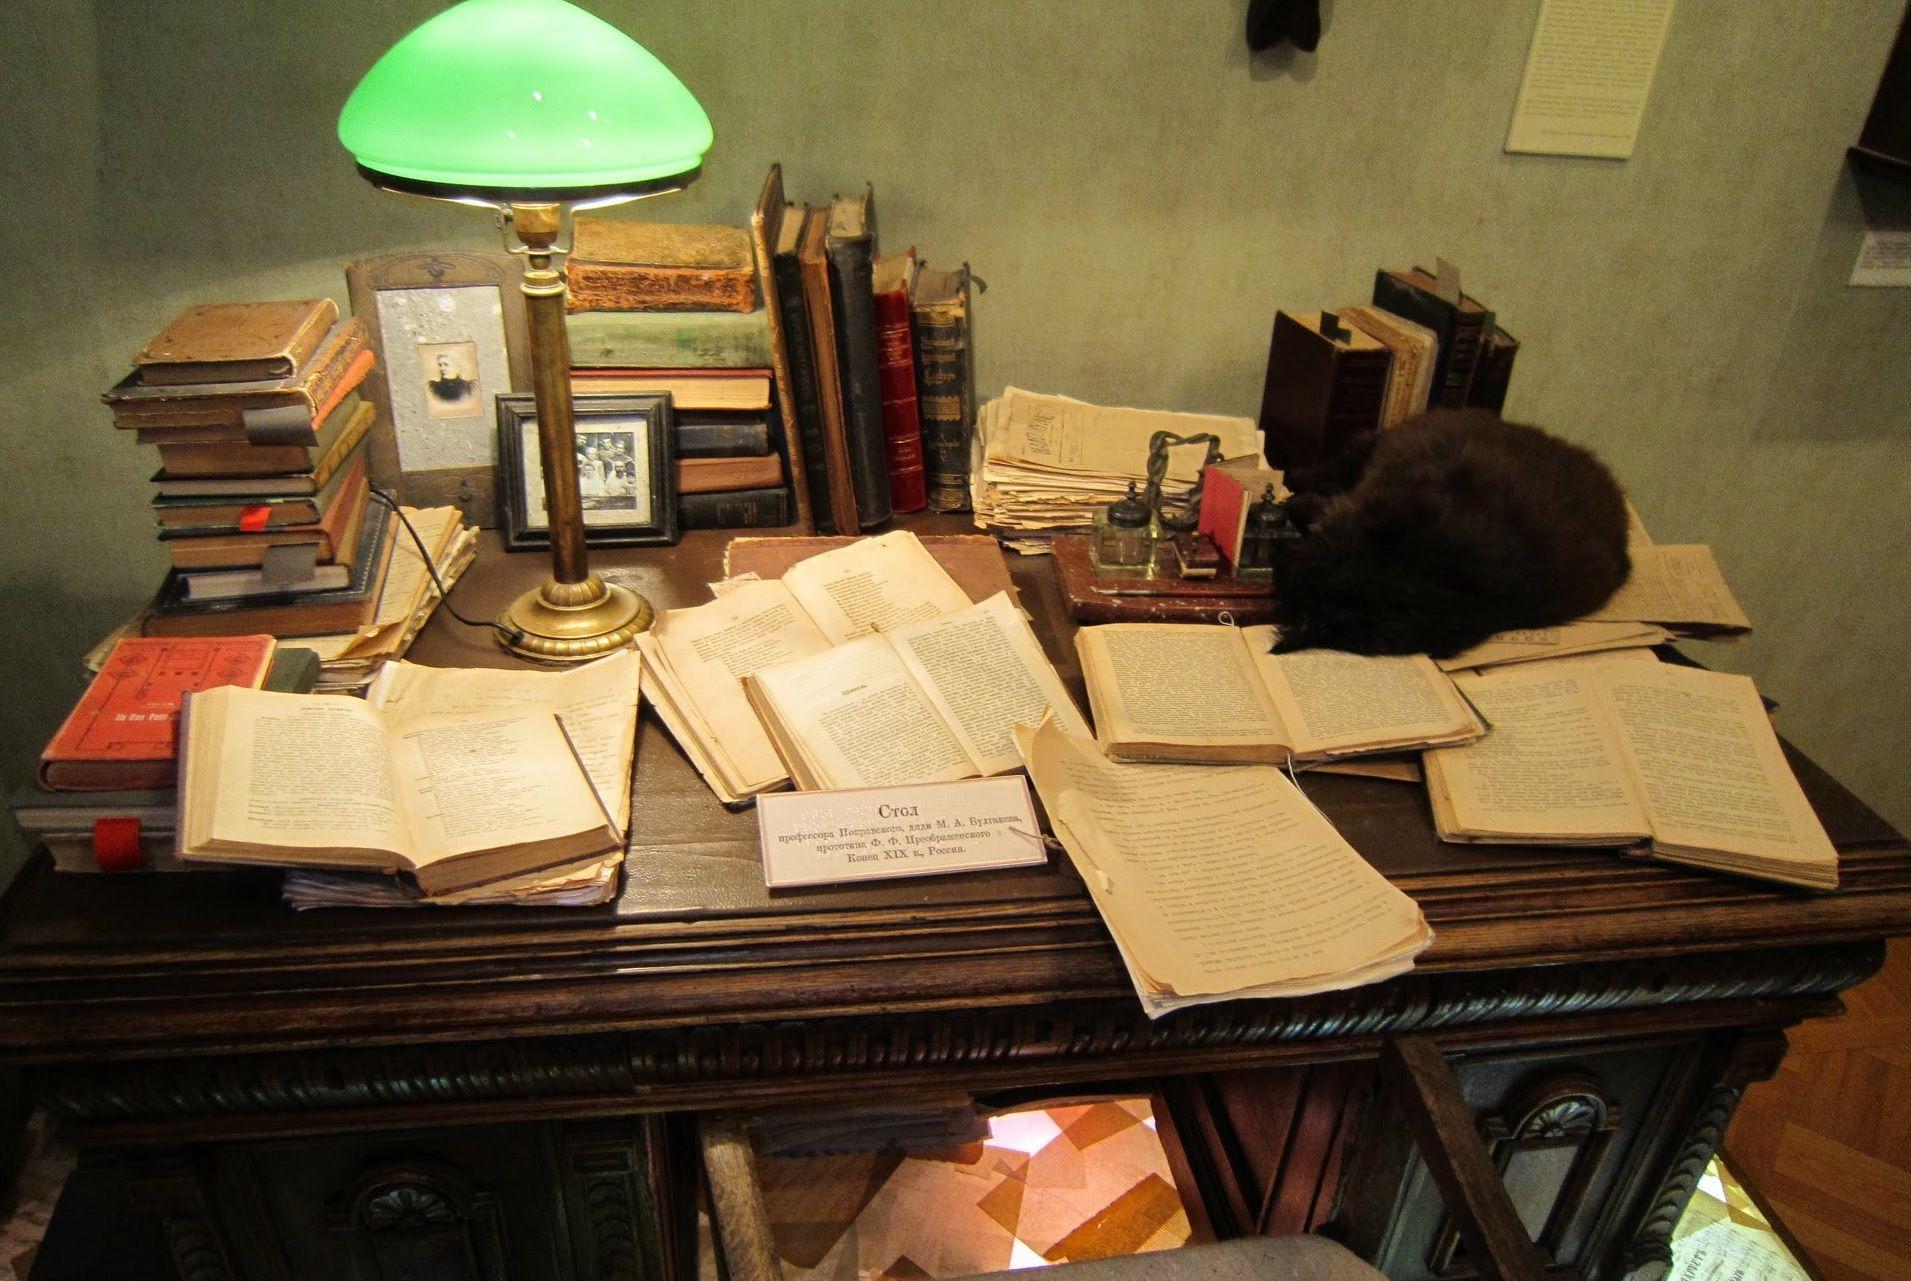 Онлайн-экскурсия по Музею Михаила Булгакова фото 3